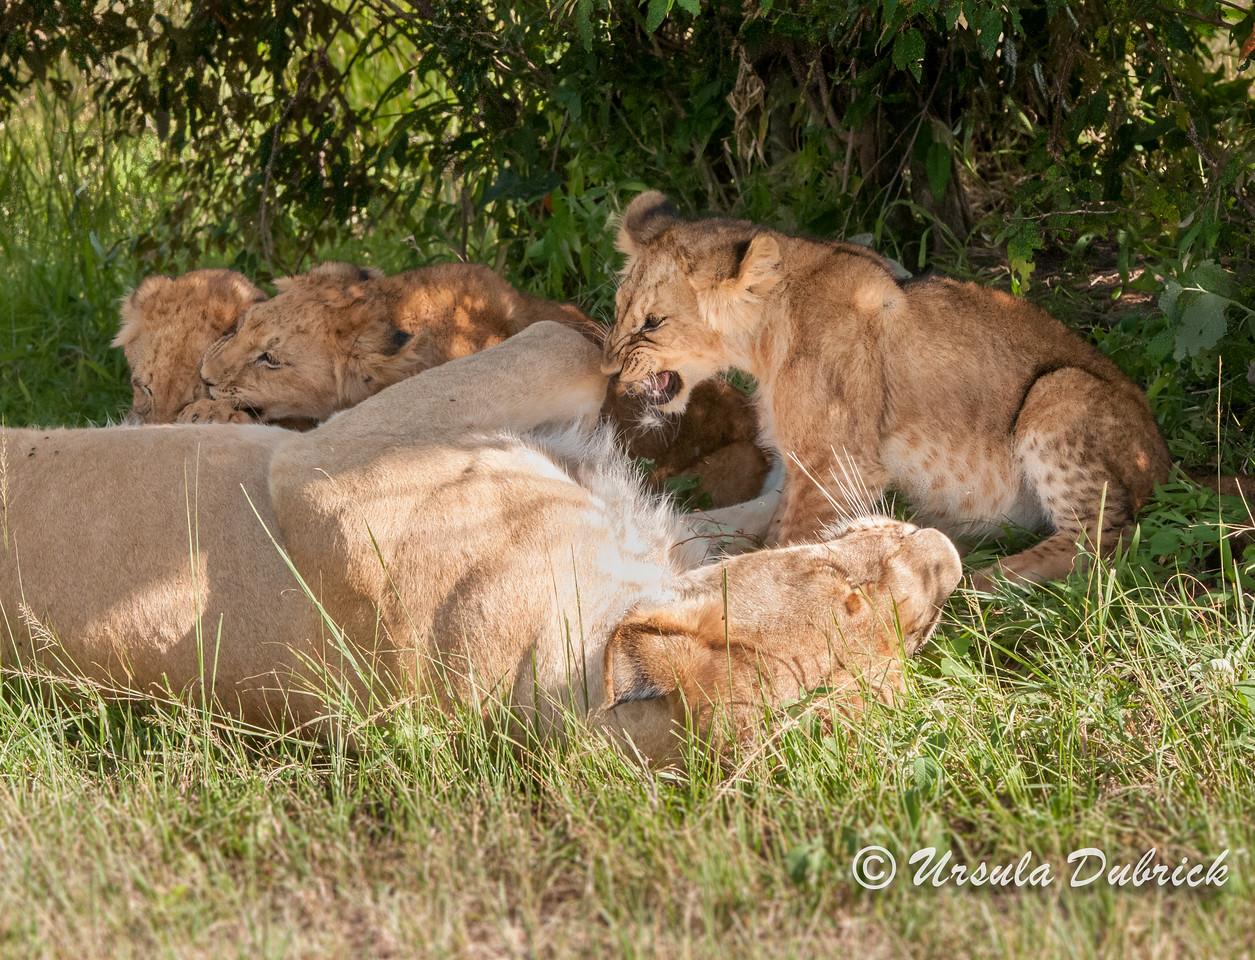 Lion cub wanting to nurse